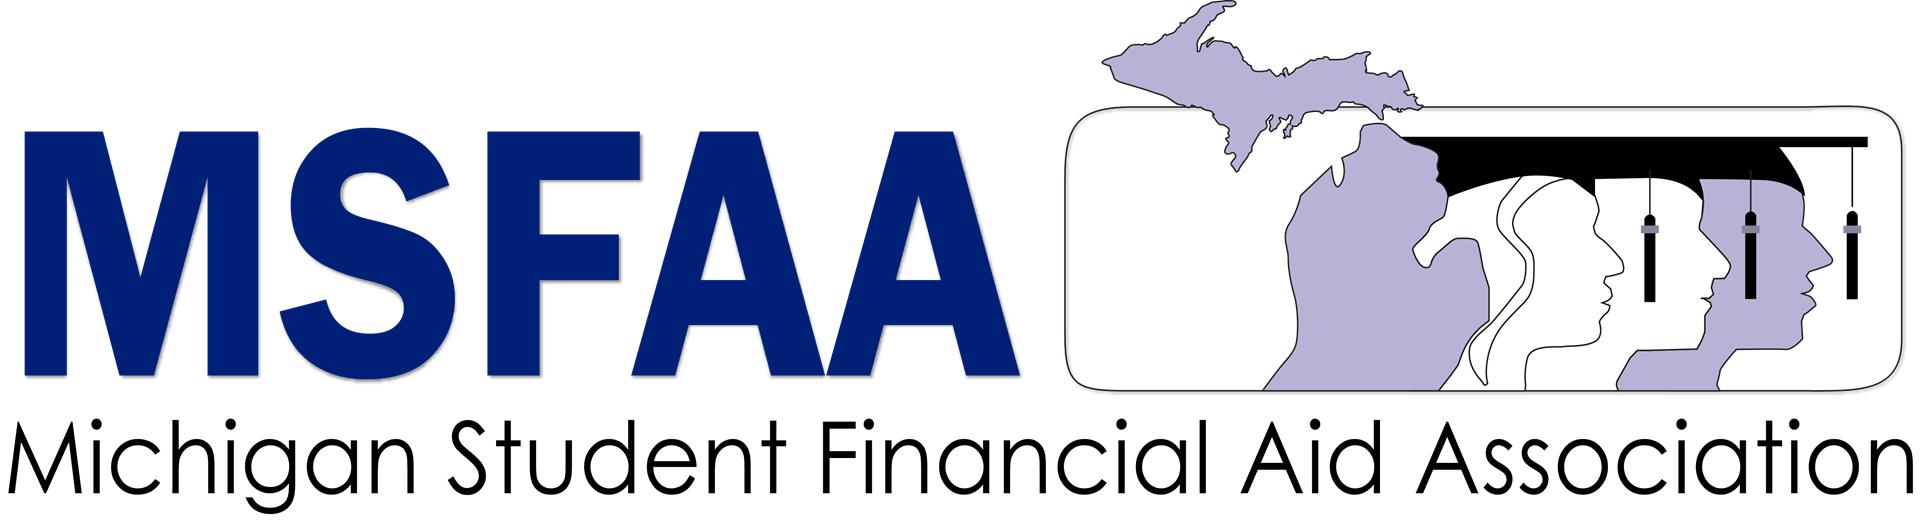 Michigan Student Financial Aid Association - MSFAA Looking Back